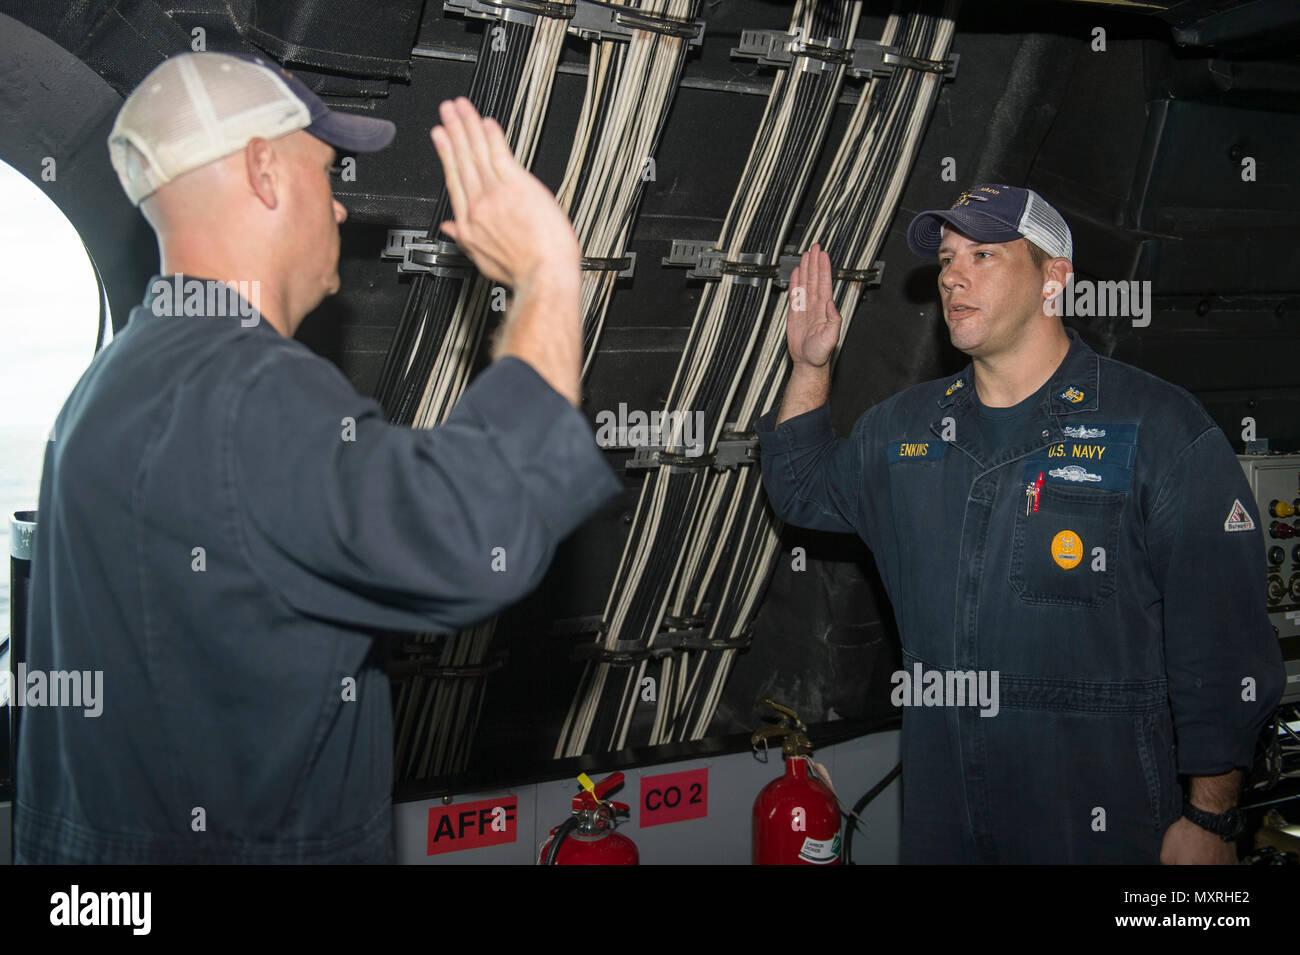 61da03c4a Command Master Chief Petty Officer Stock Photos & Command Master ...